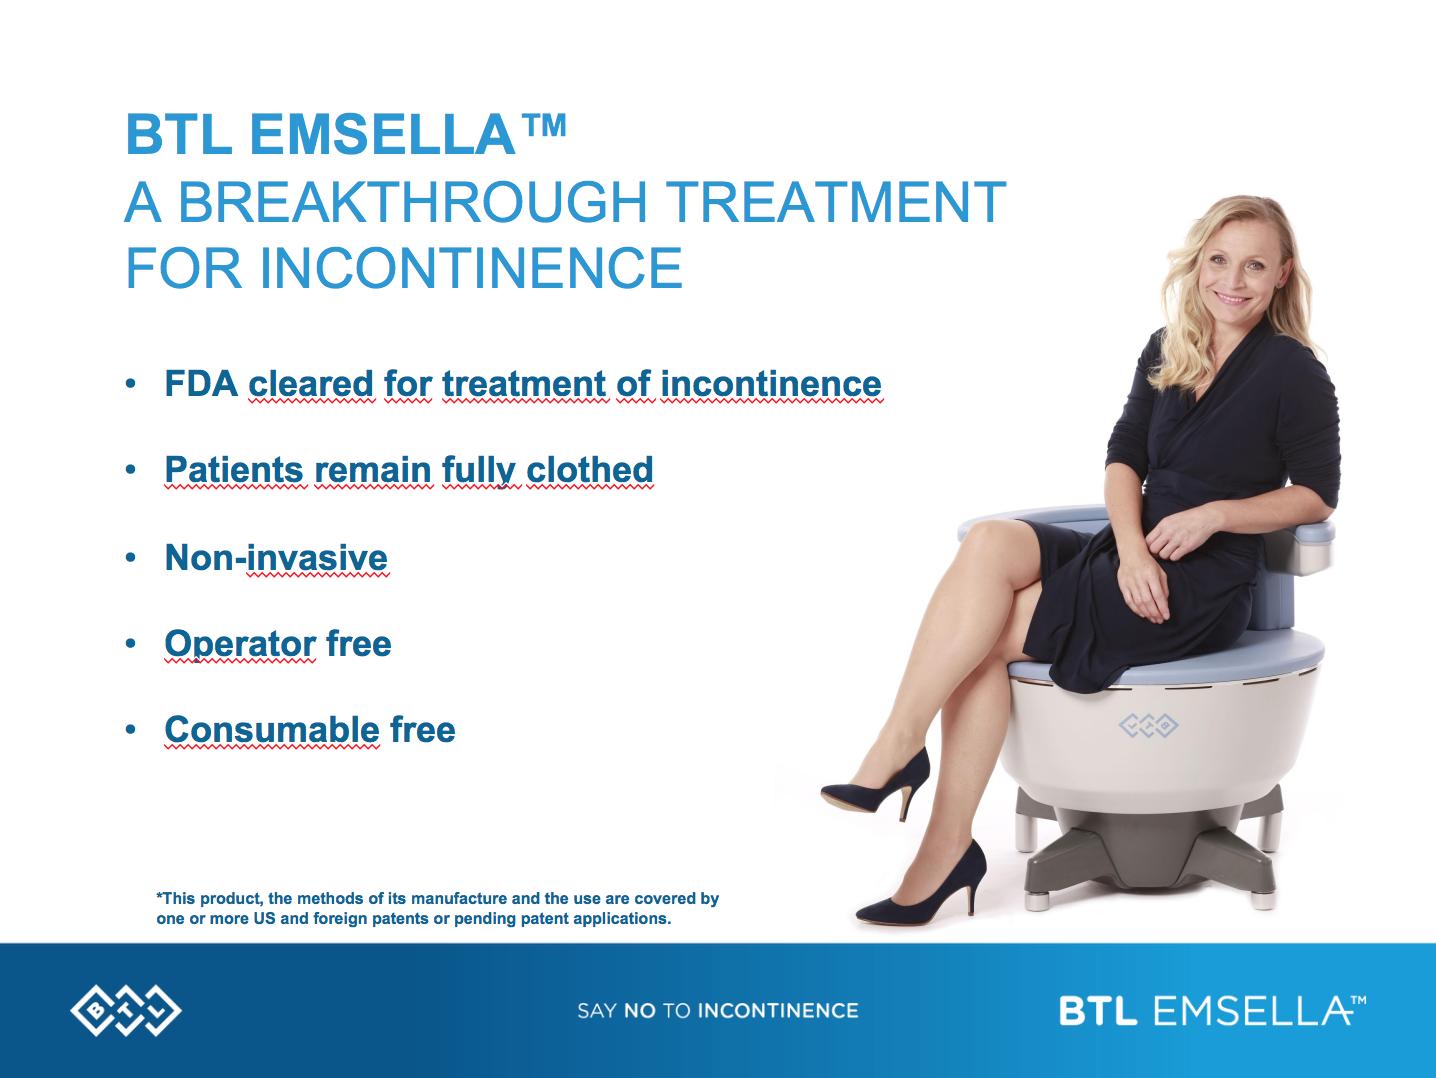 BTL Emsella A breaktrhough treatment for incontinence